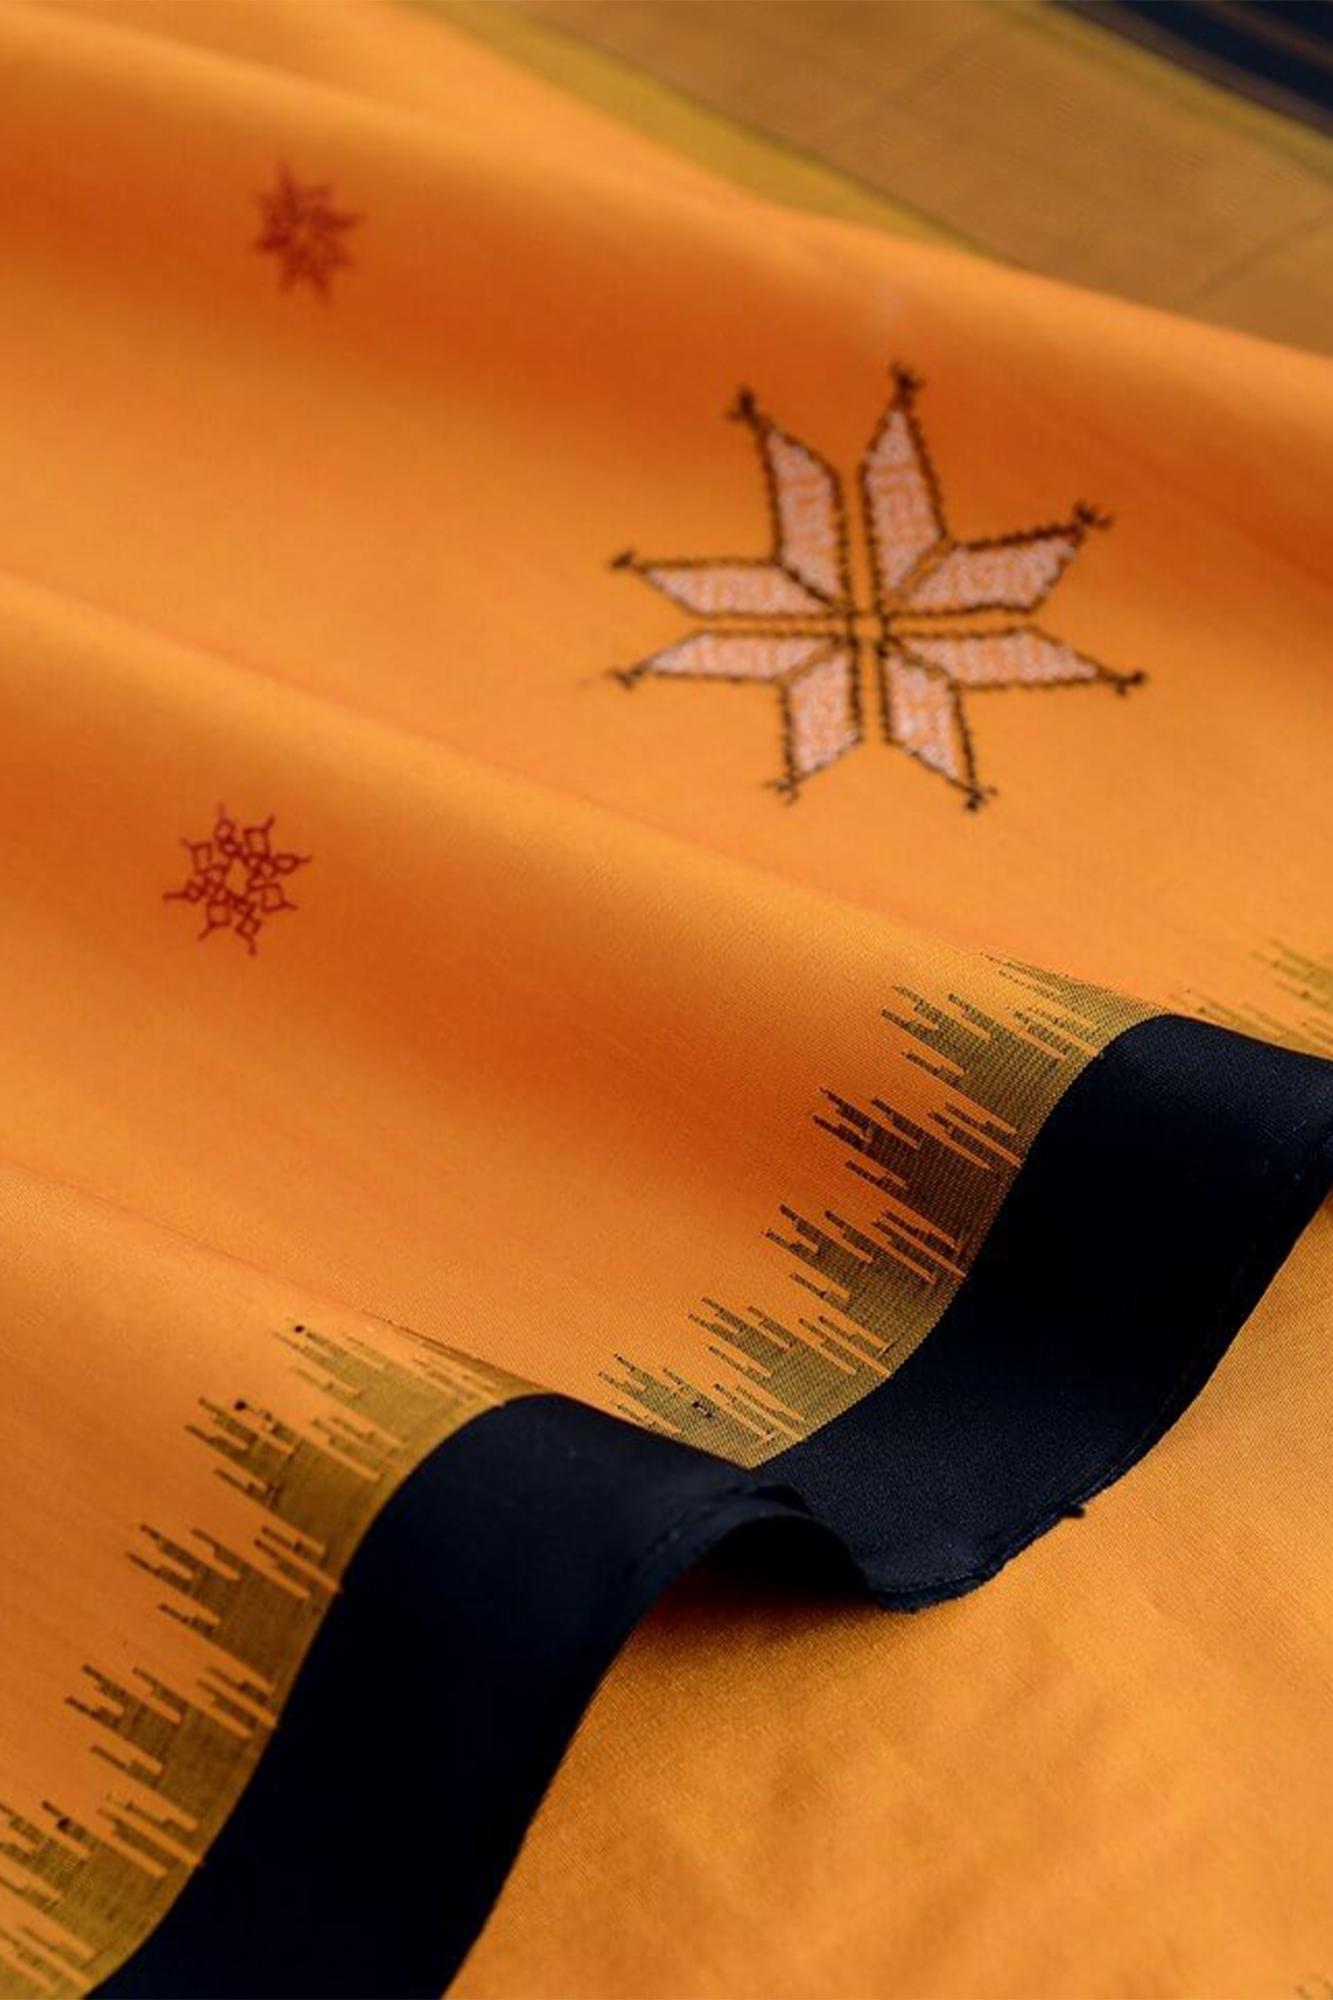 Maya-Curated-Kanjivaram-Silk-Sarees-Online-Kasuti-Range-Handwoven-Handmade-Make-In-India-Handcrafted-In-India-sq